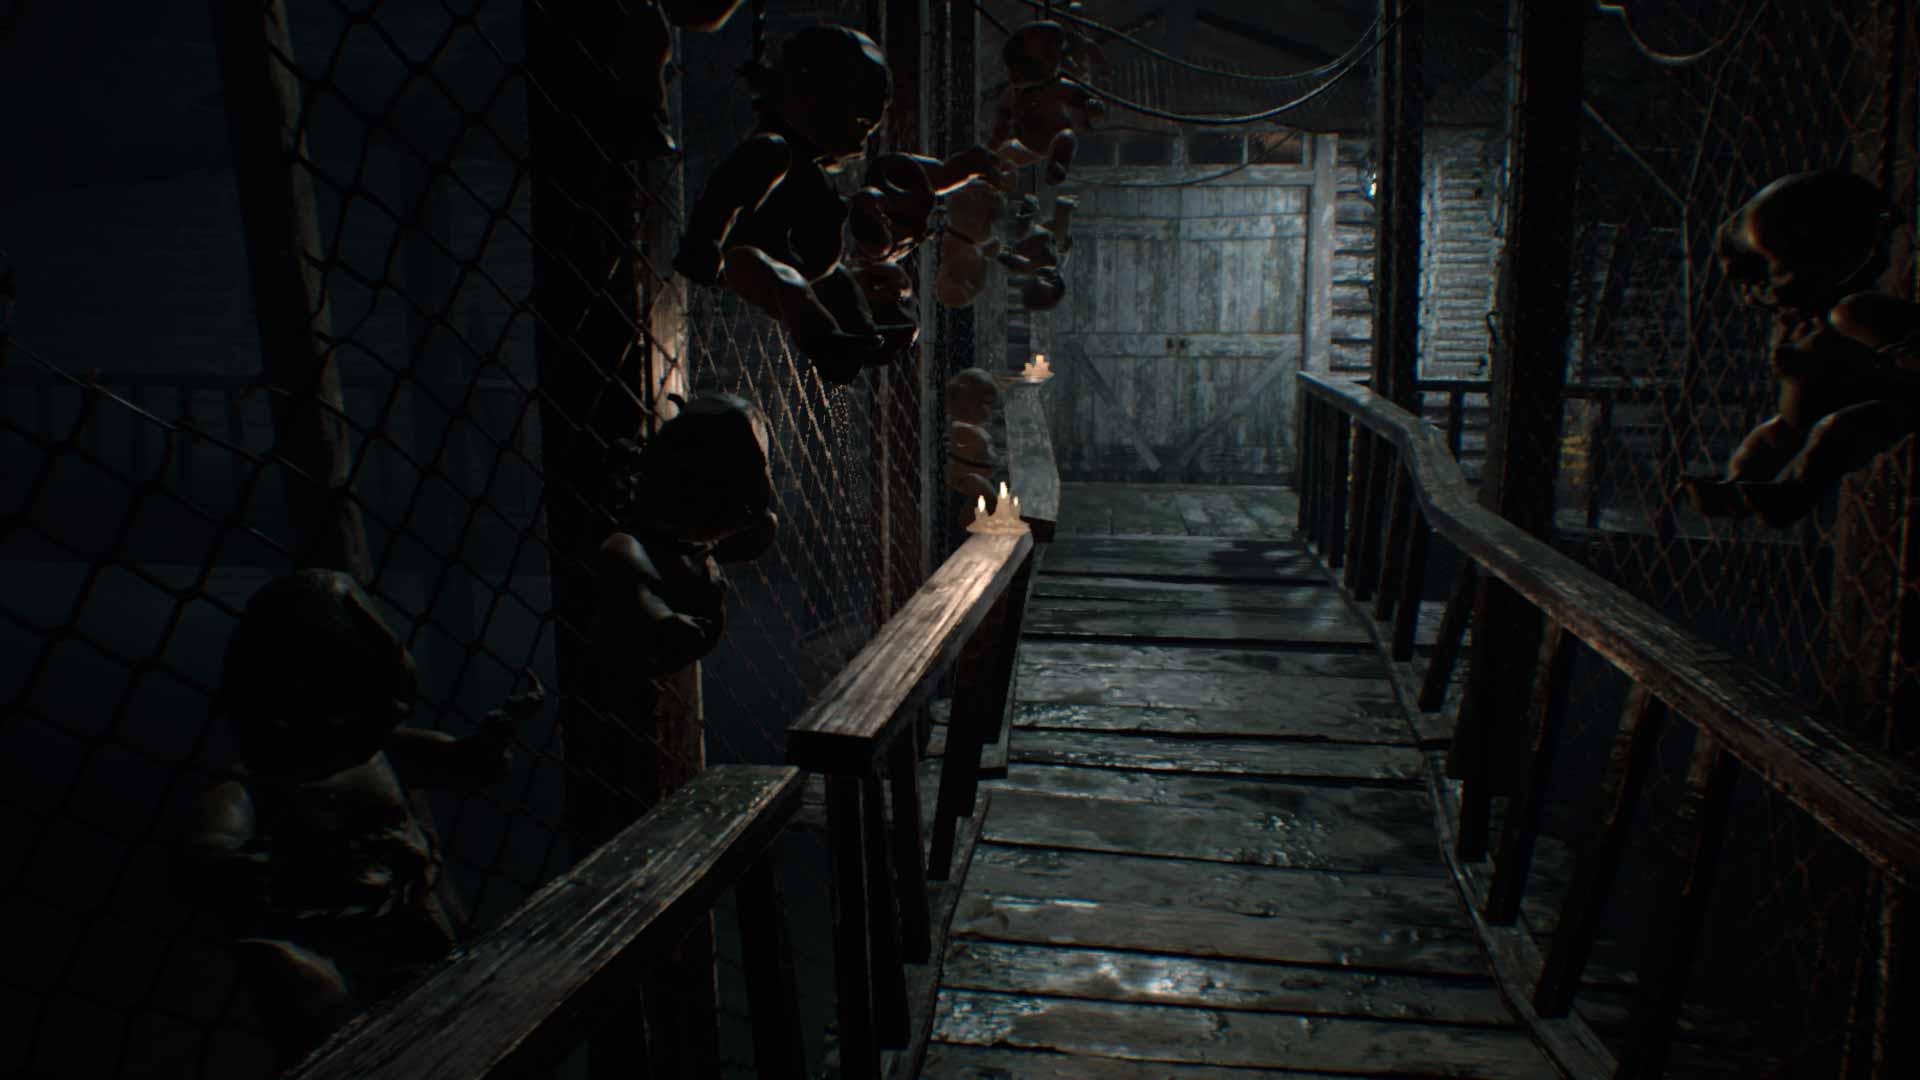 Análisis de Resident Evil 7 Biohazard 2